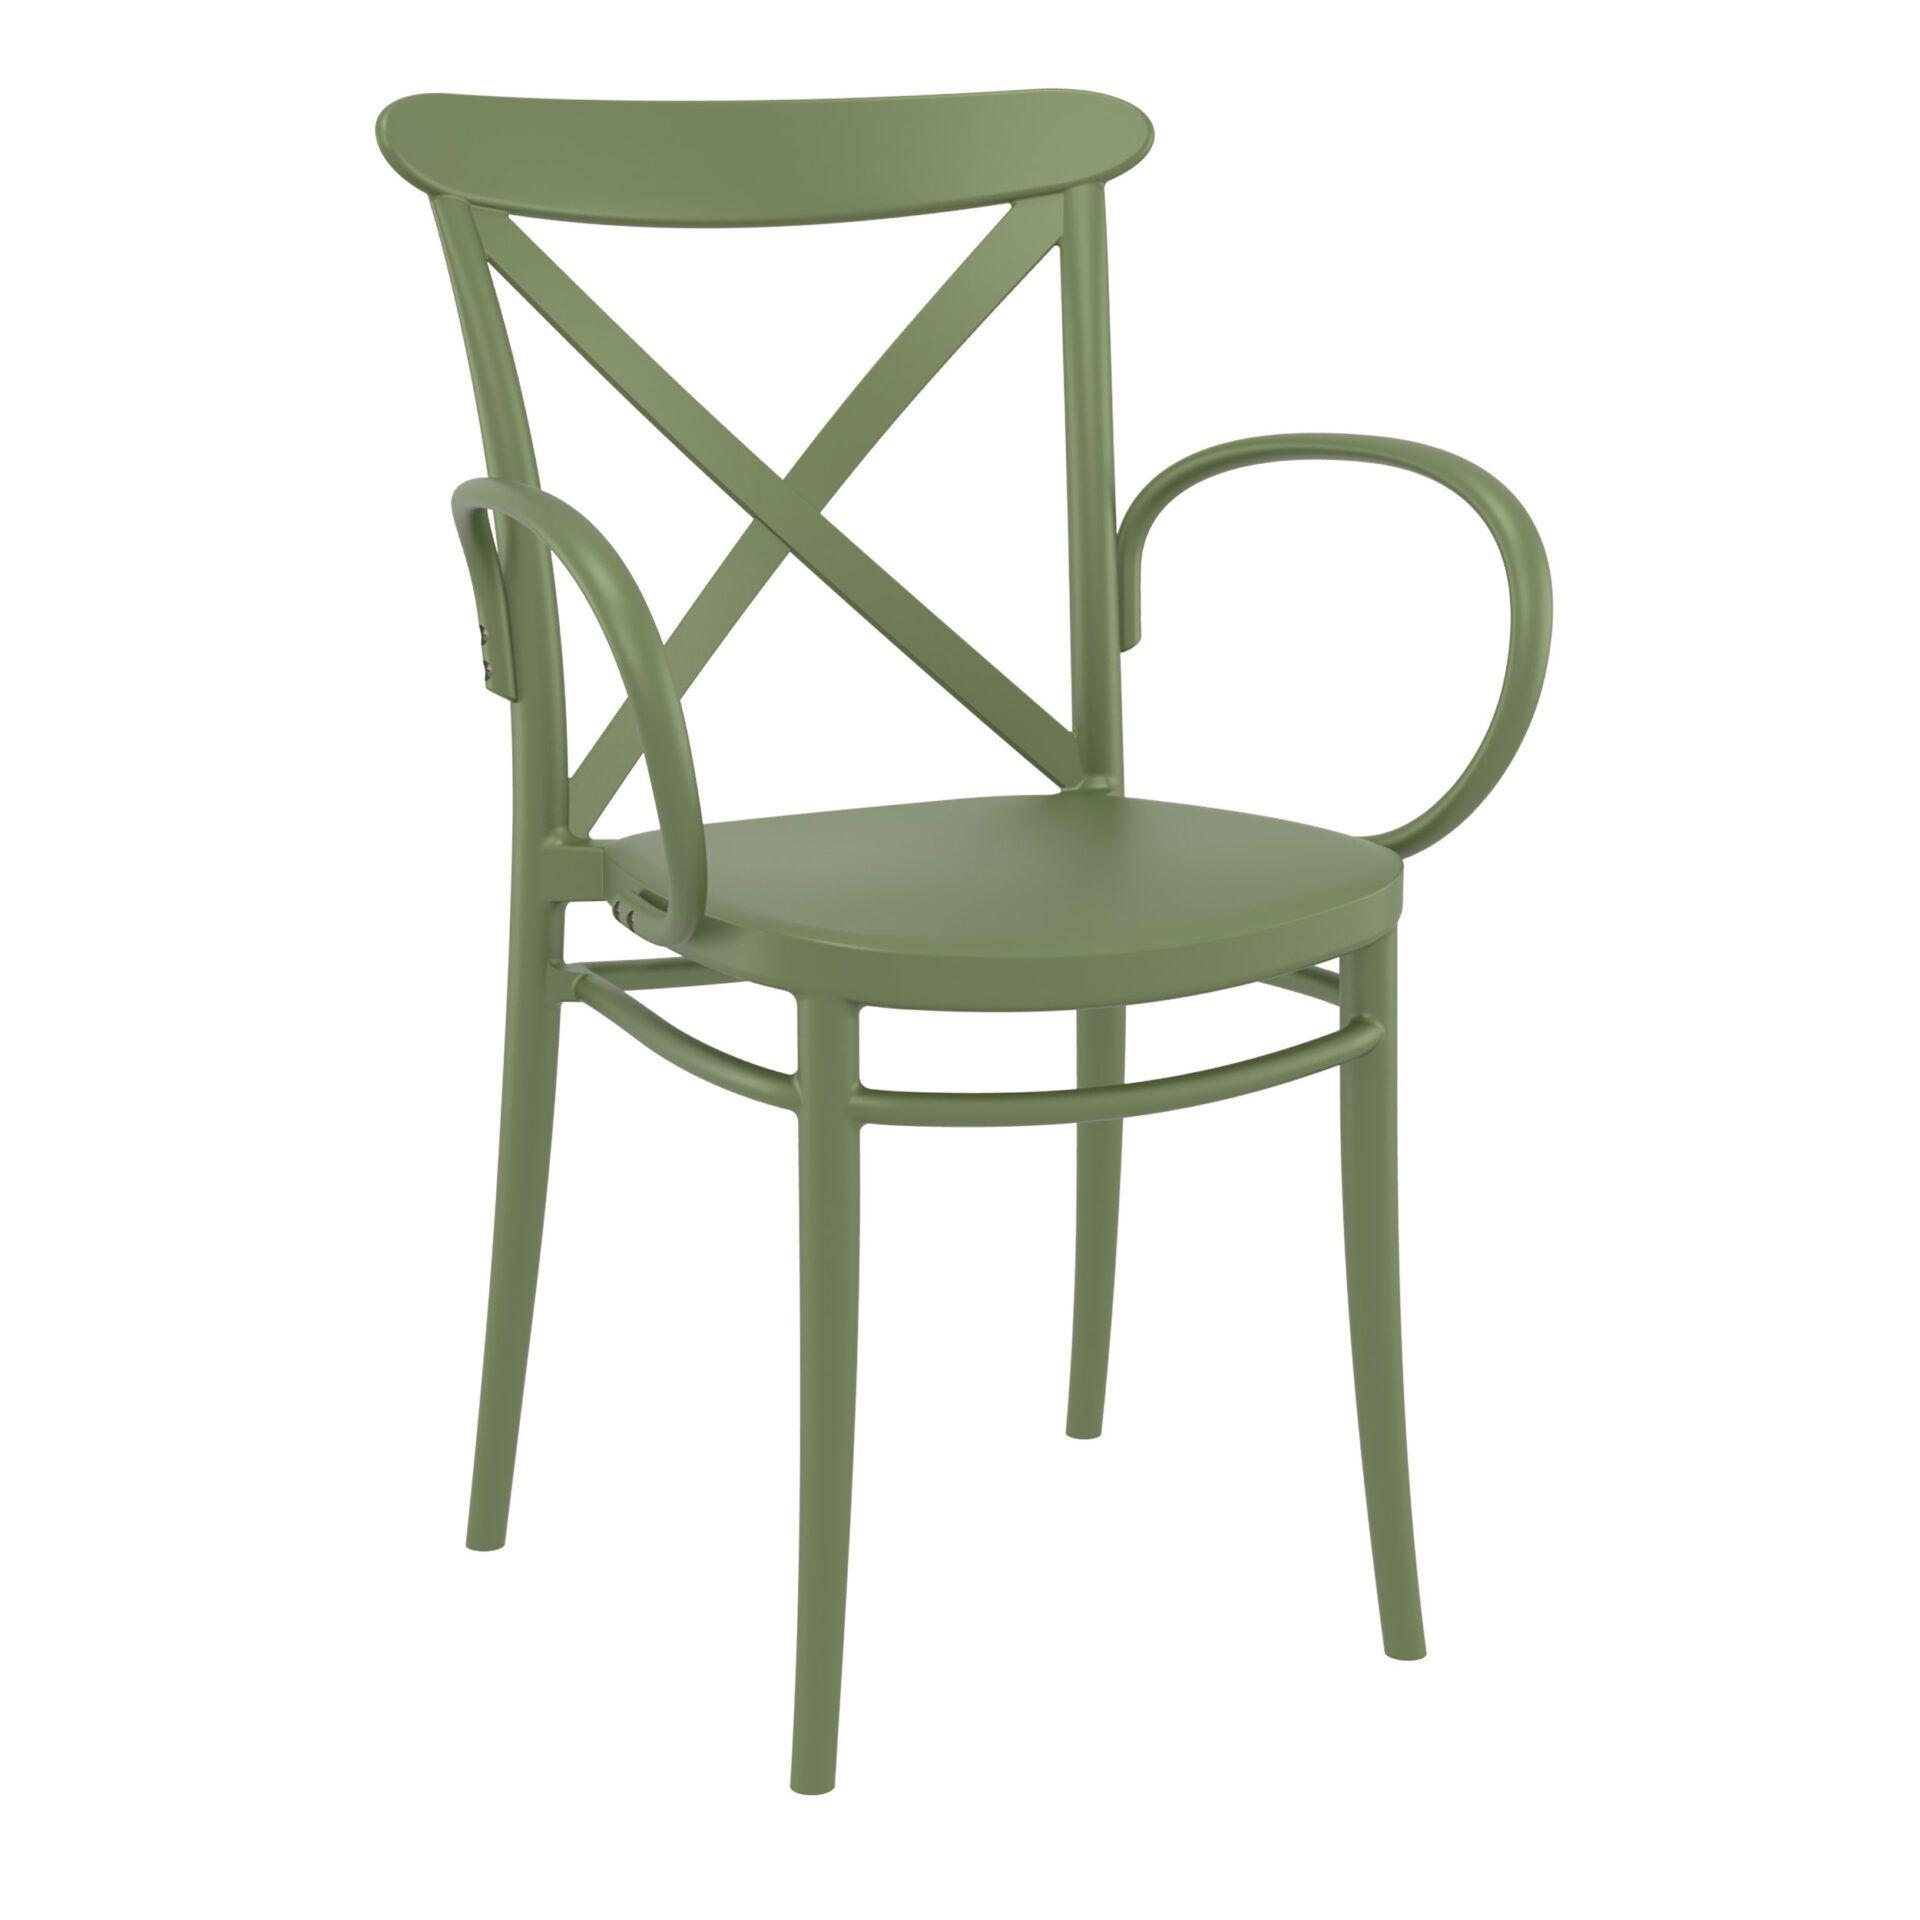 cafe polypropylene cross armchair olive green front side